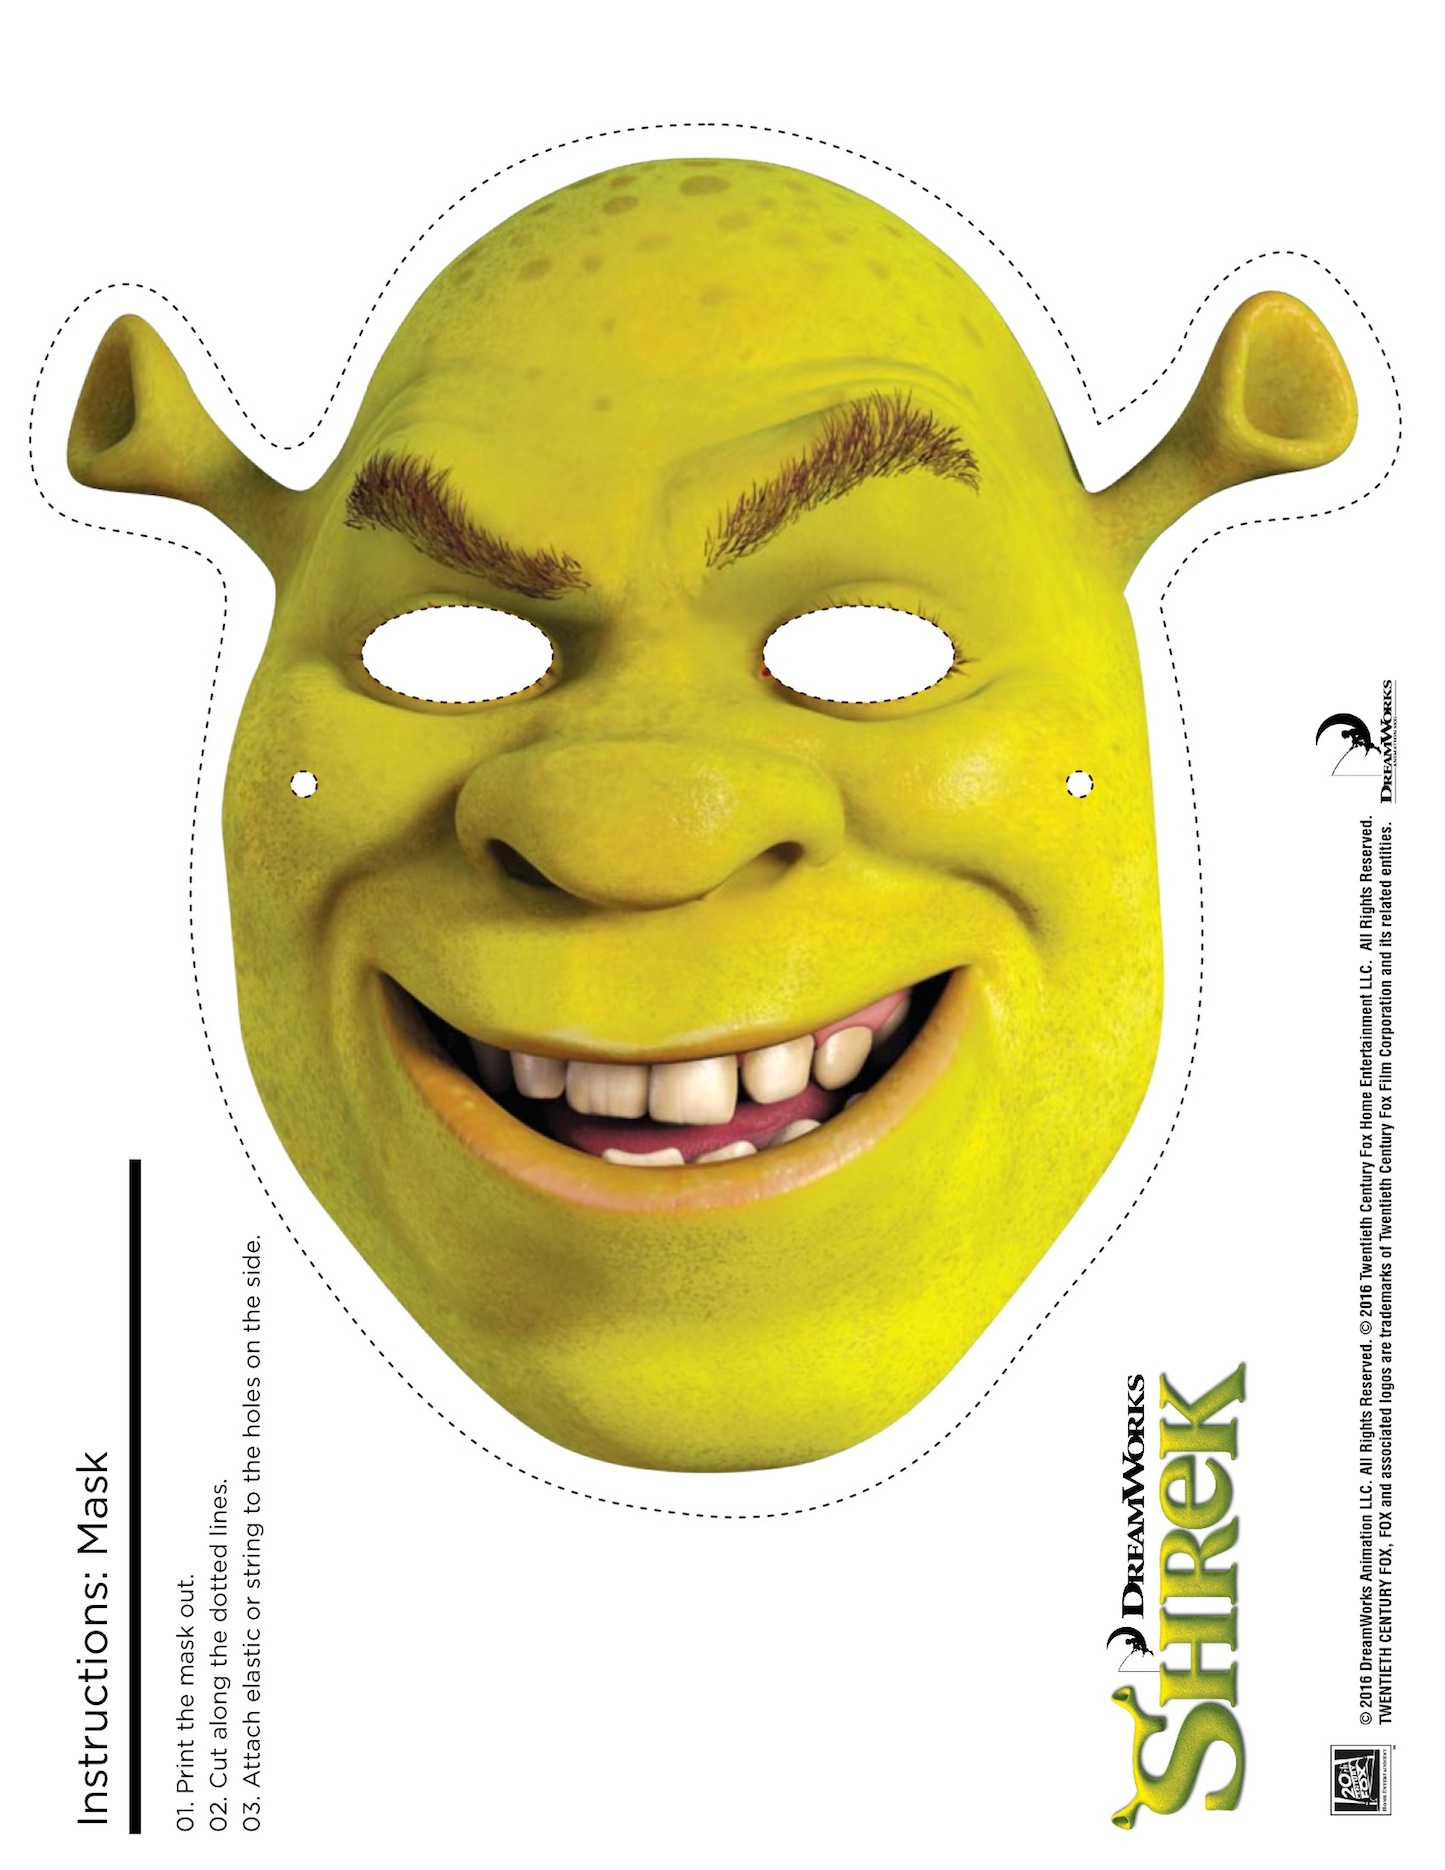 4 Shrek Free Printable Masks: Shrek, Fiona, Donkey, Puss In Boots - Free Printable Shrek Birthday Invitations